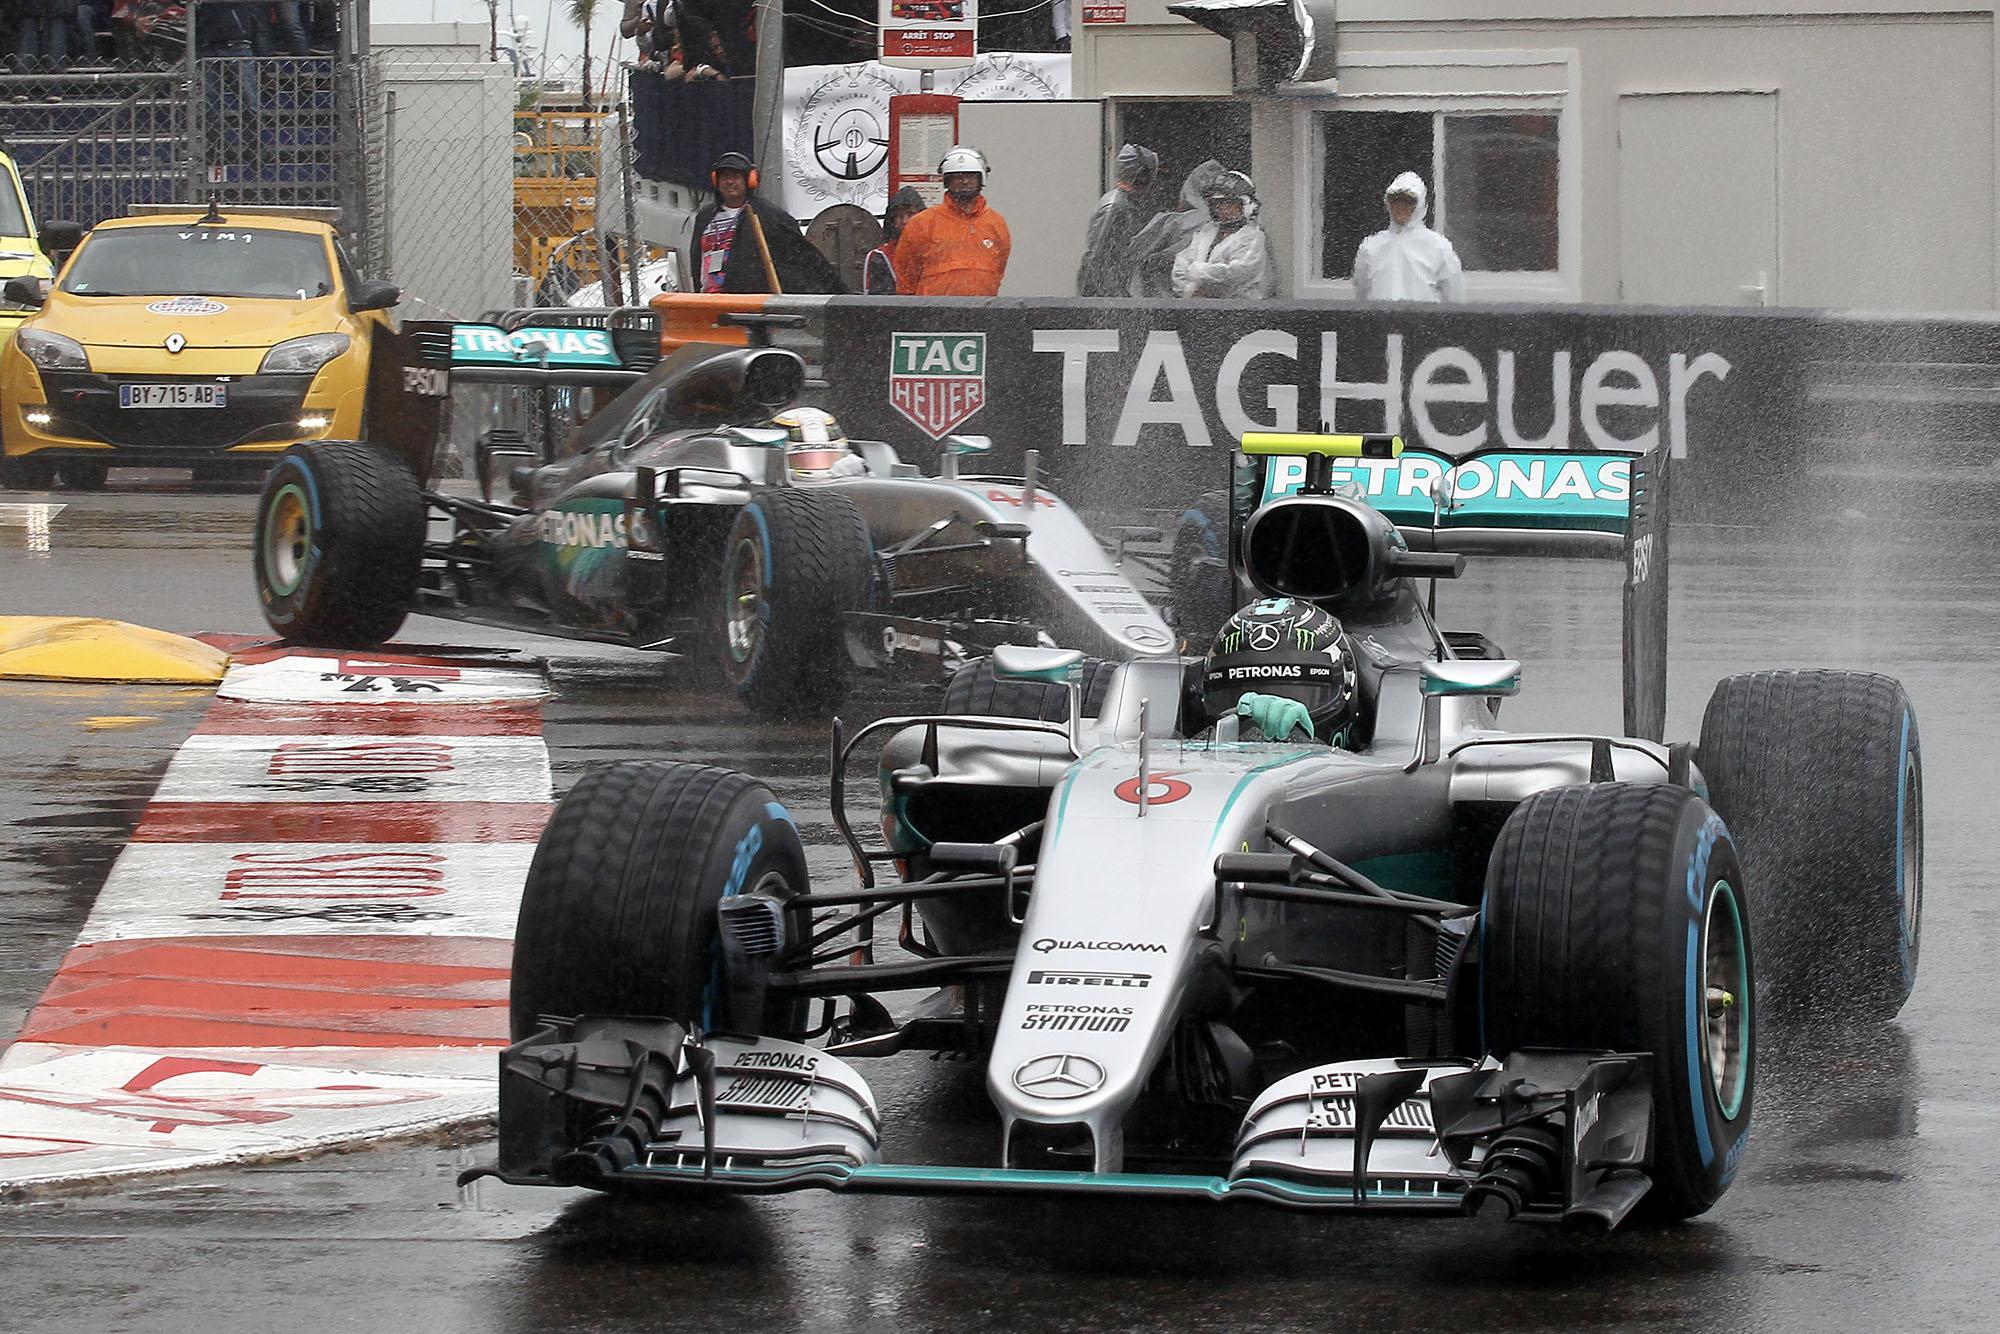 Nico Rosberg Lewis Hamilton Mercedes 2016 Monaco Grand Prix